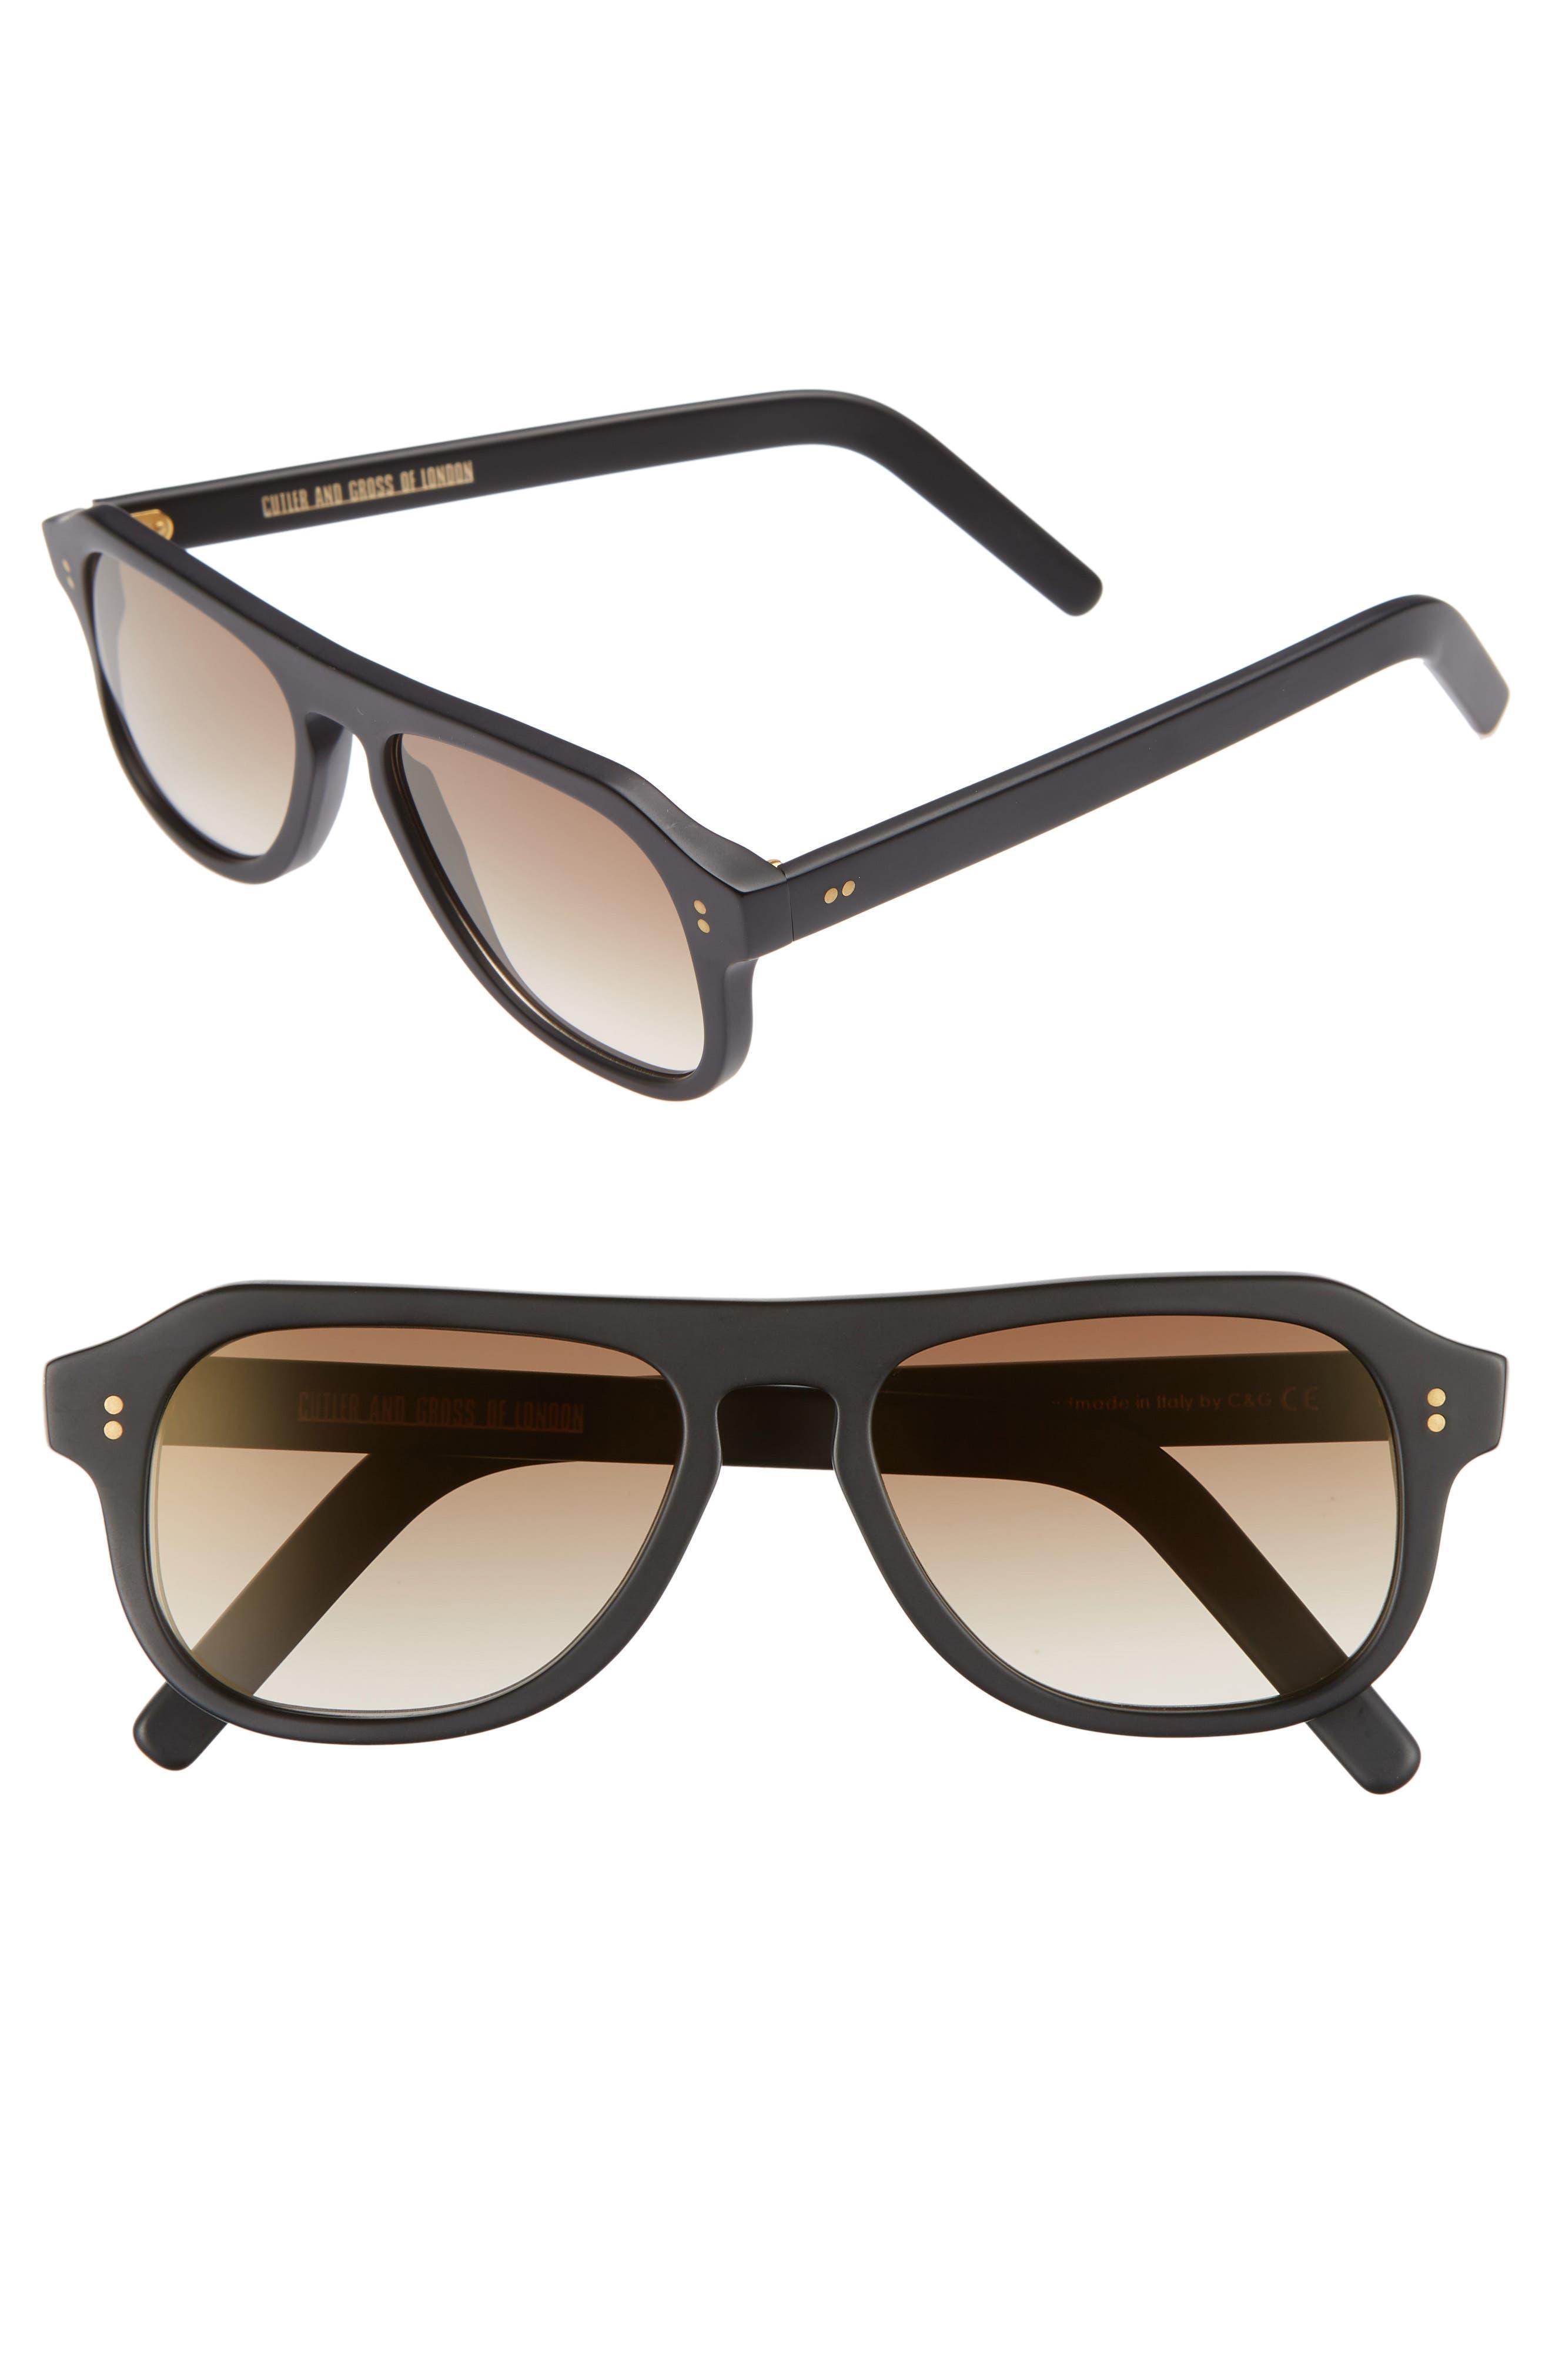 53mm Polarized Sunglasses,                             Main thumbnail 1, color,                             MATTE BLACK/ BROWN